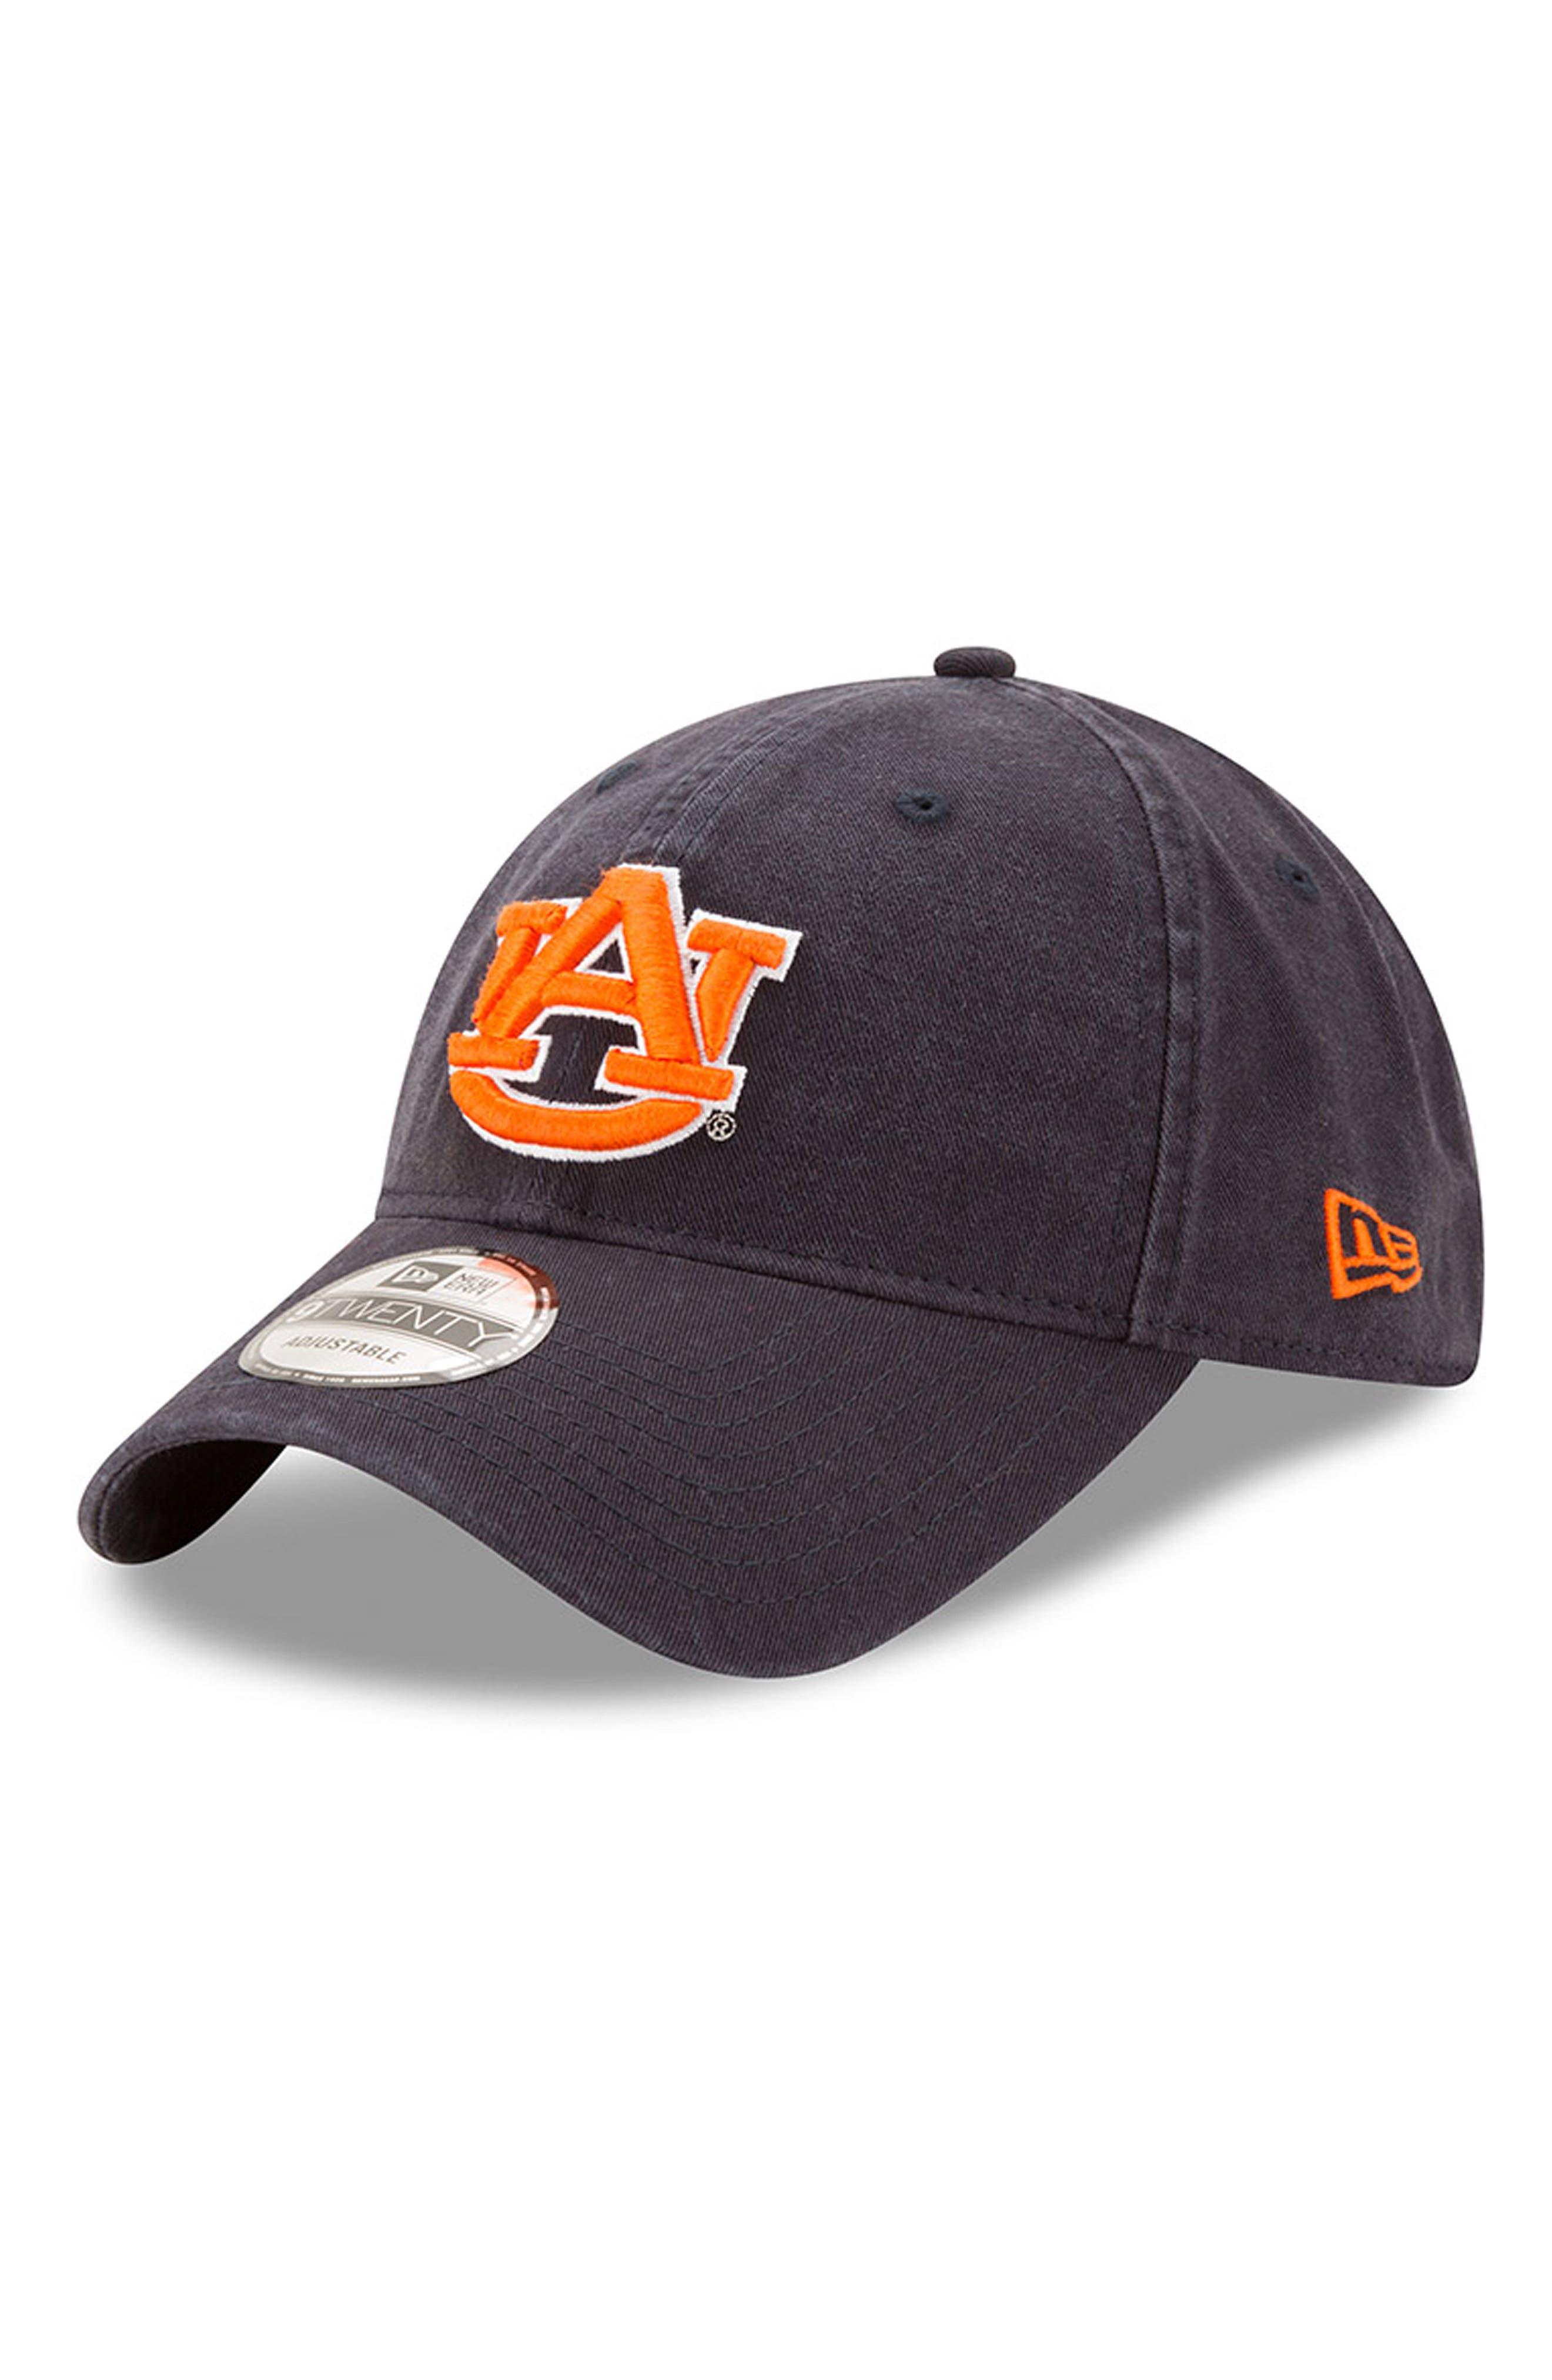 New Era Collegiate Core Classic - Auburn Tigers Baseball Cap